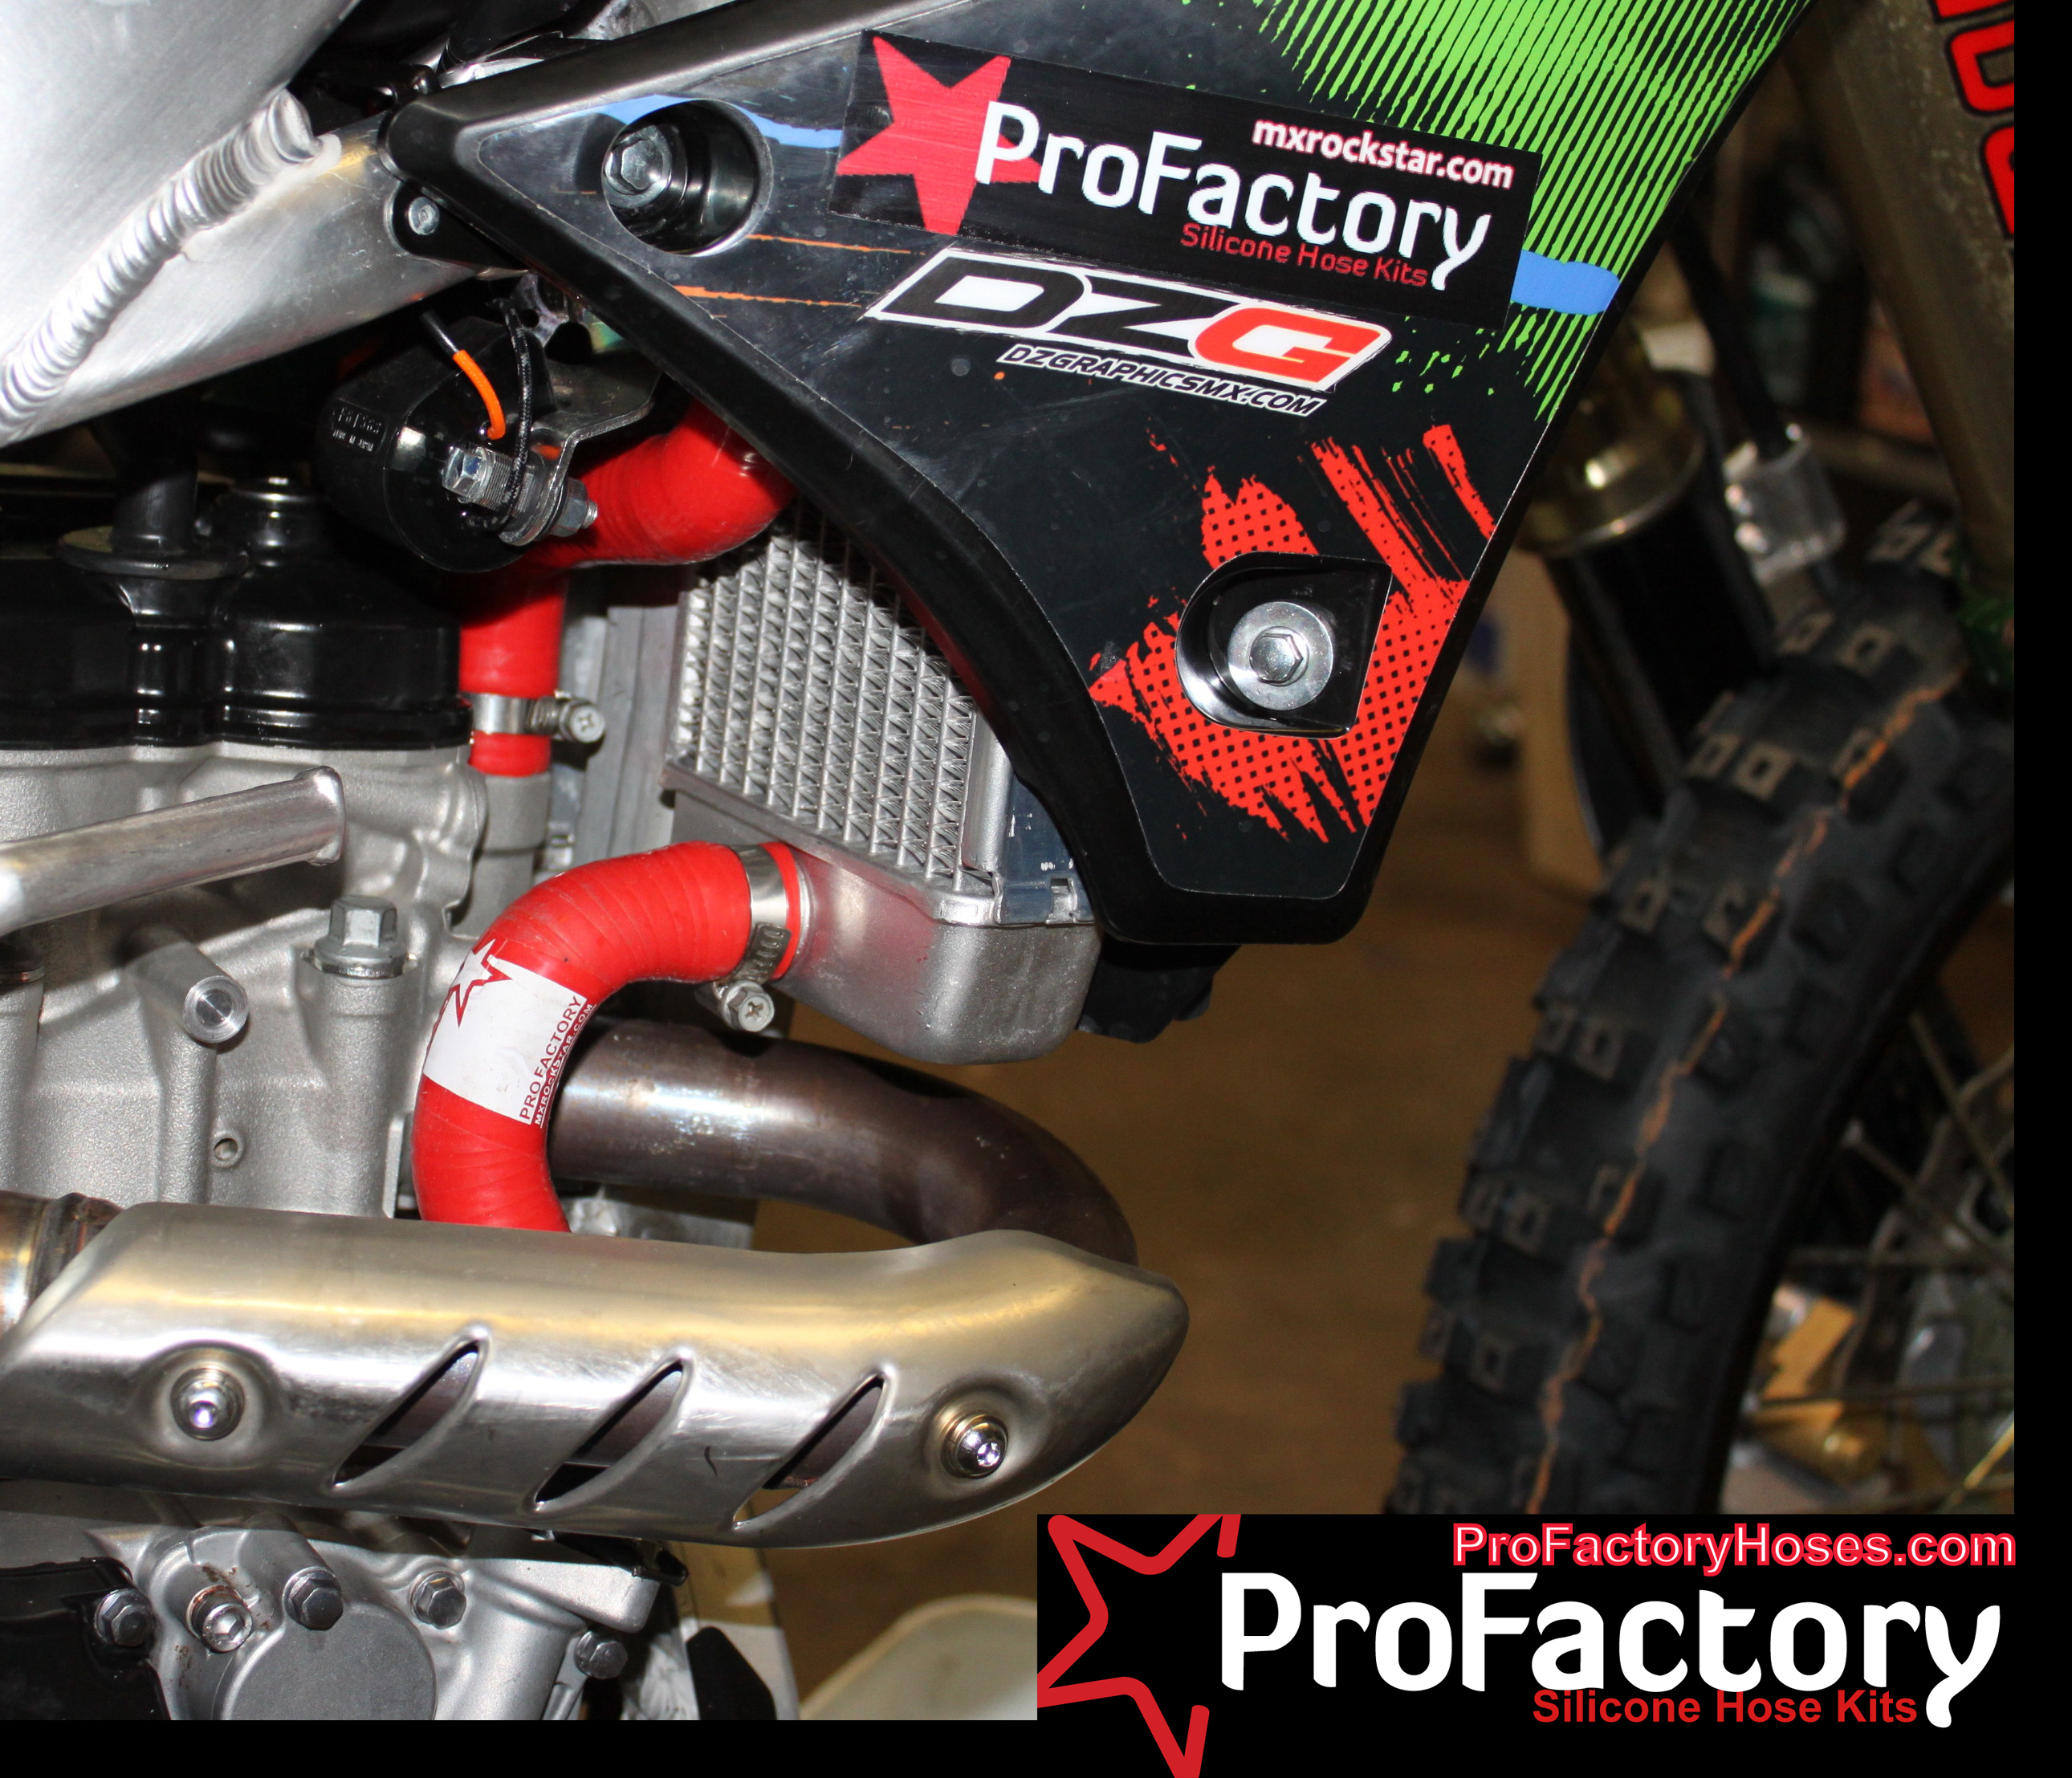 Motocross Radiator Silicone Hose Kits